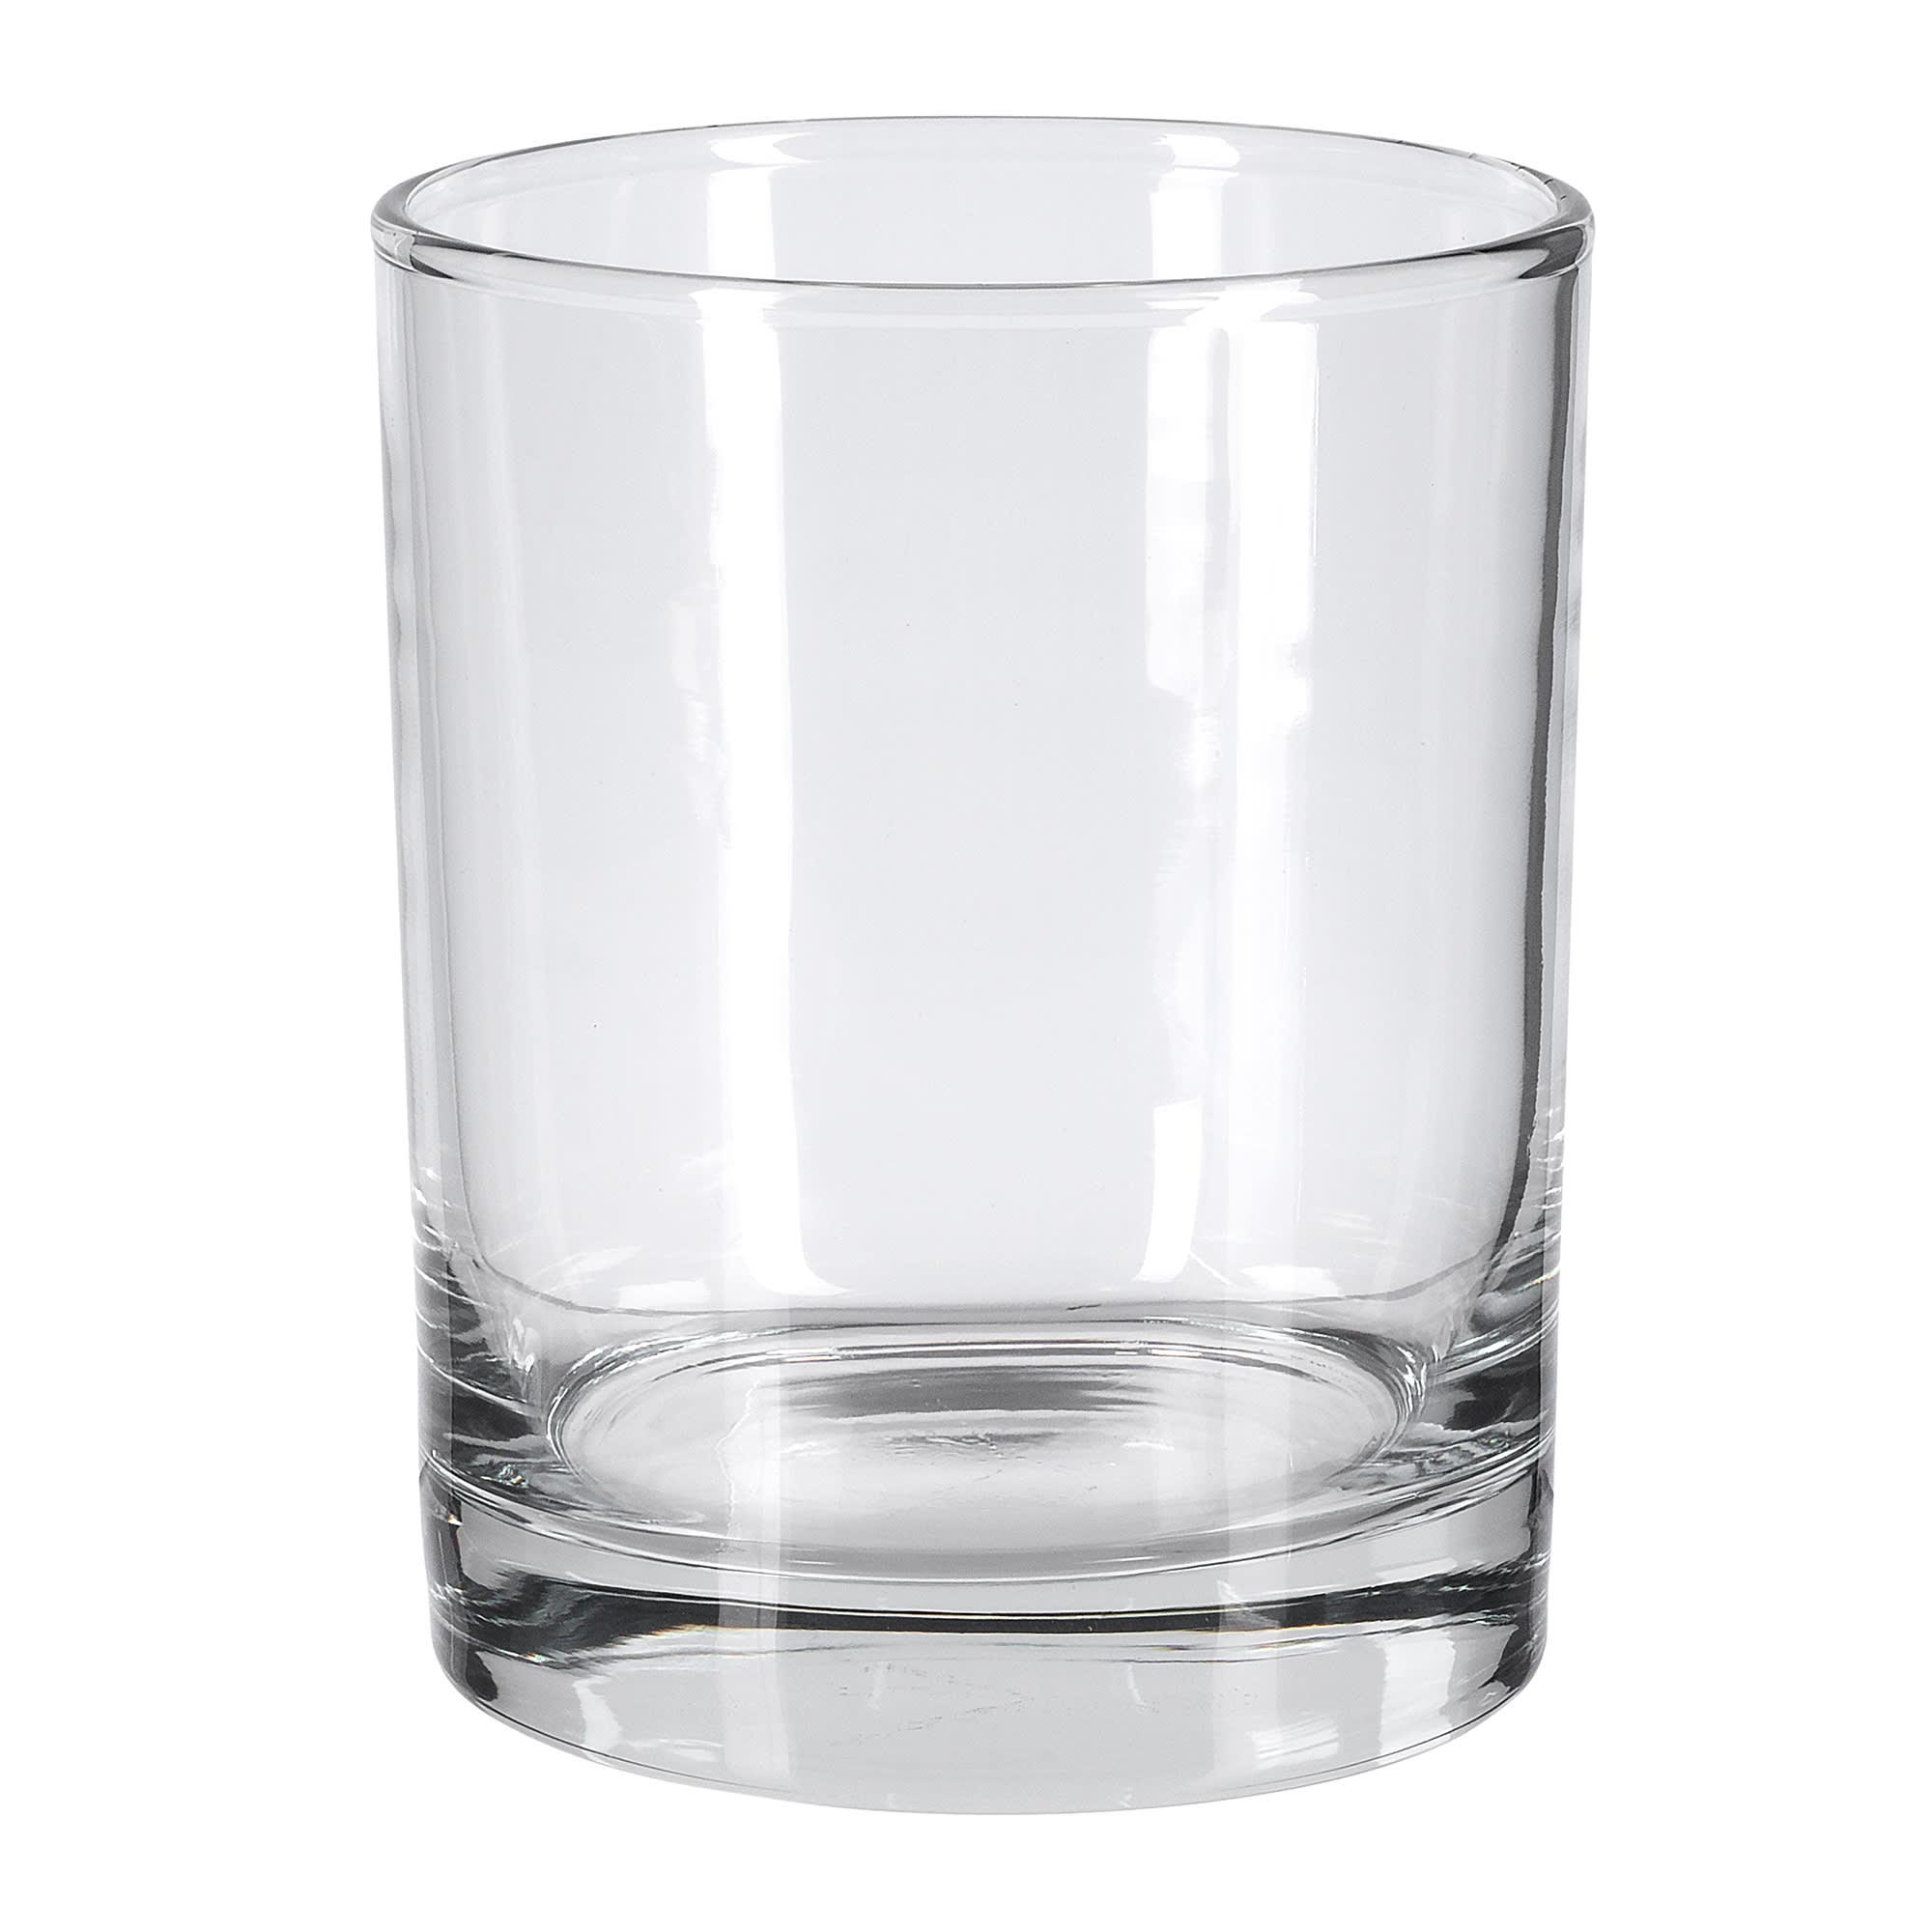 Anchor 3143U 12.5-oz Double Old Fashioned Glass - Concord